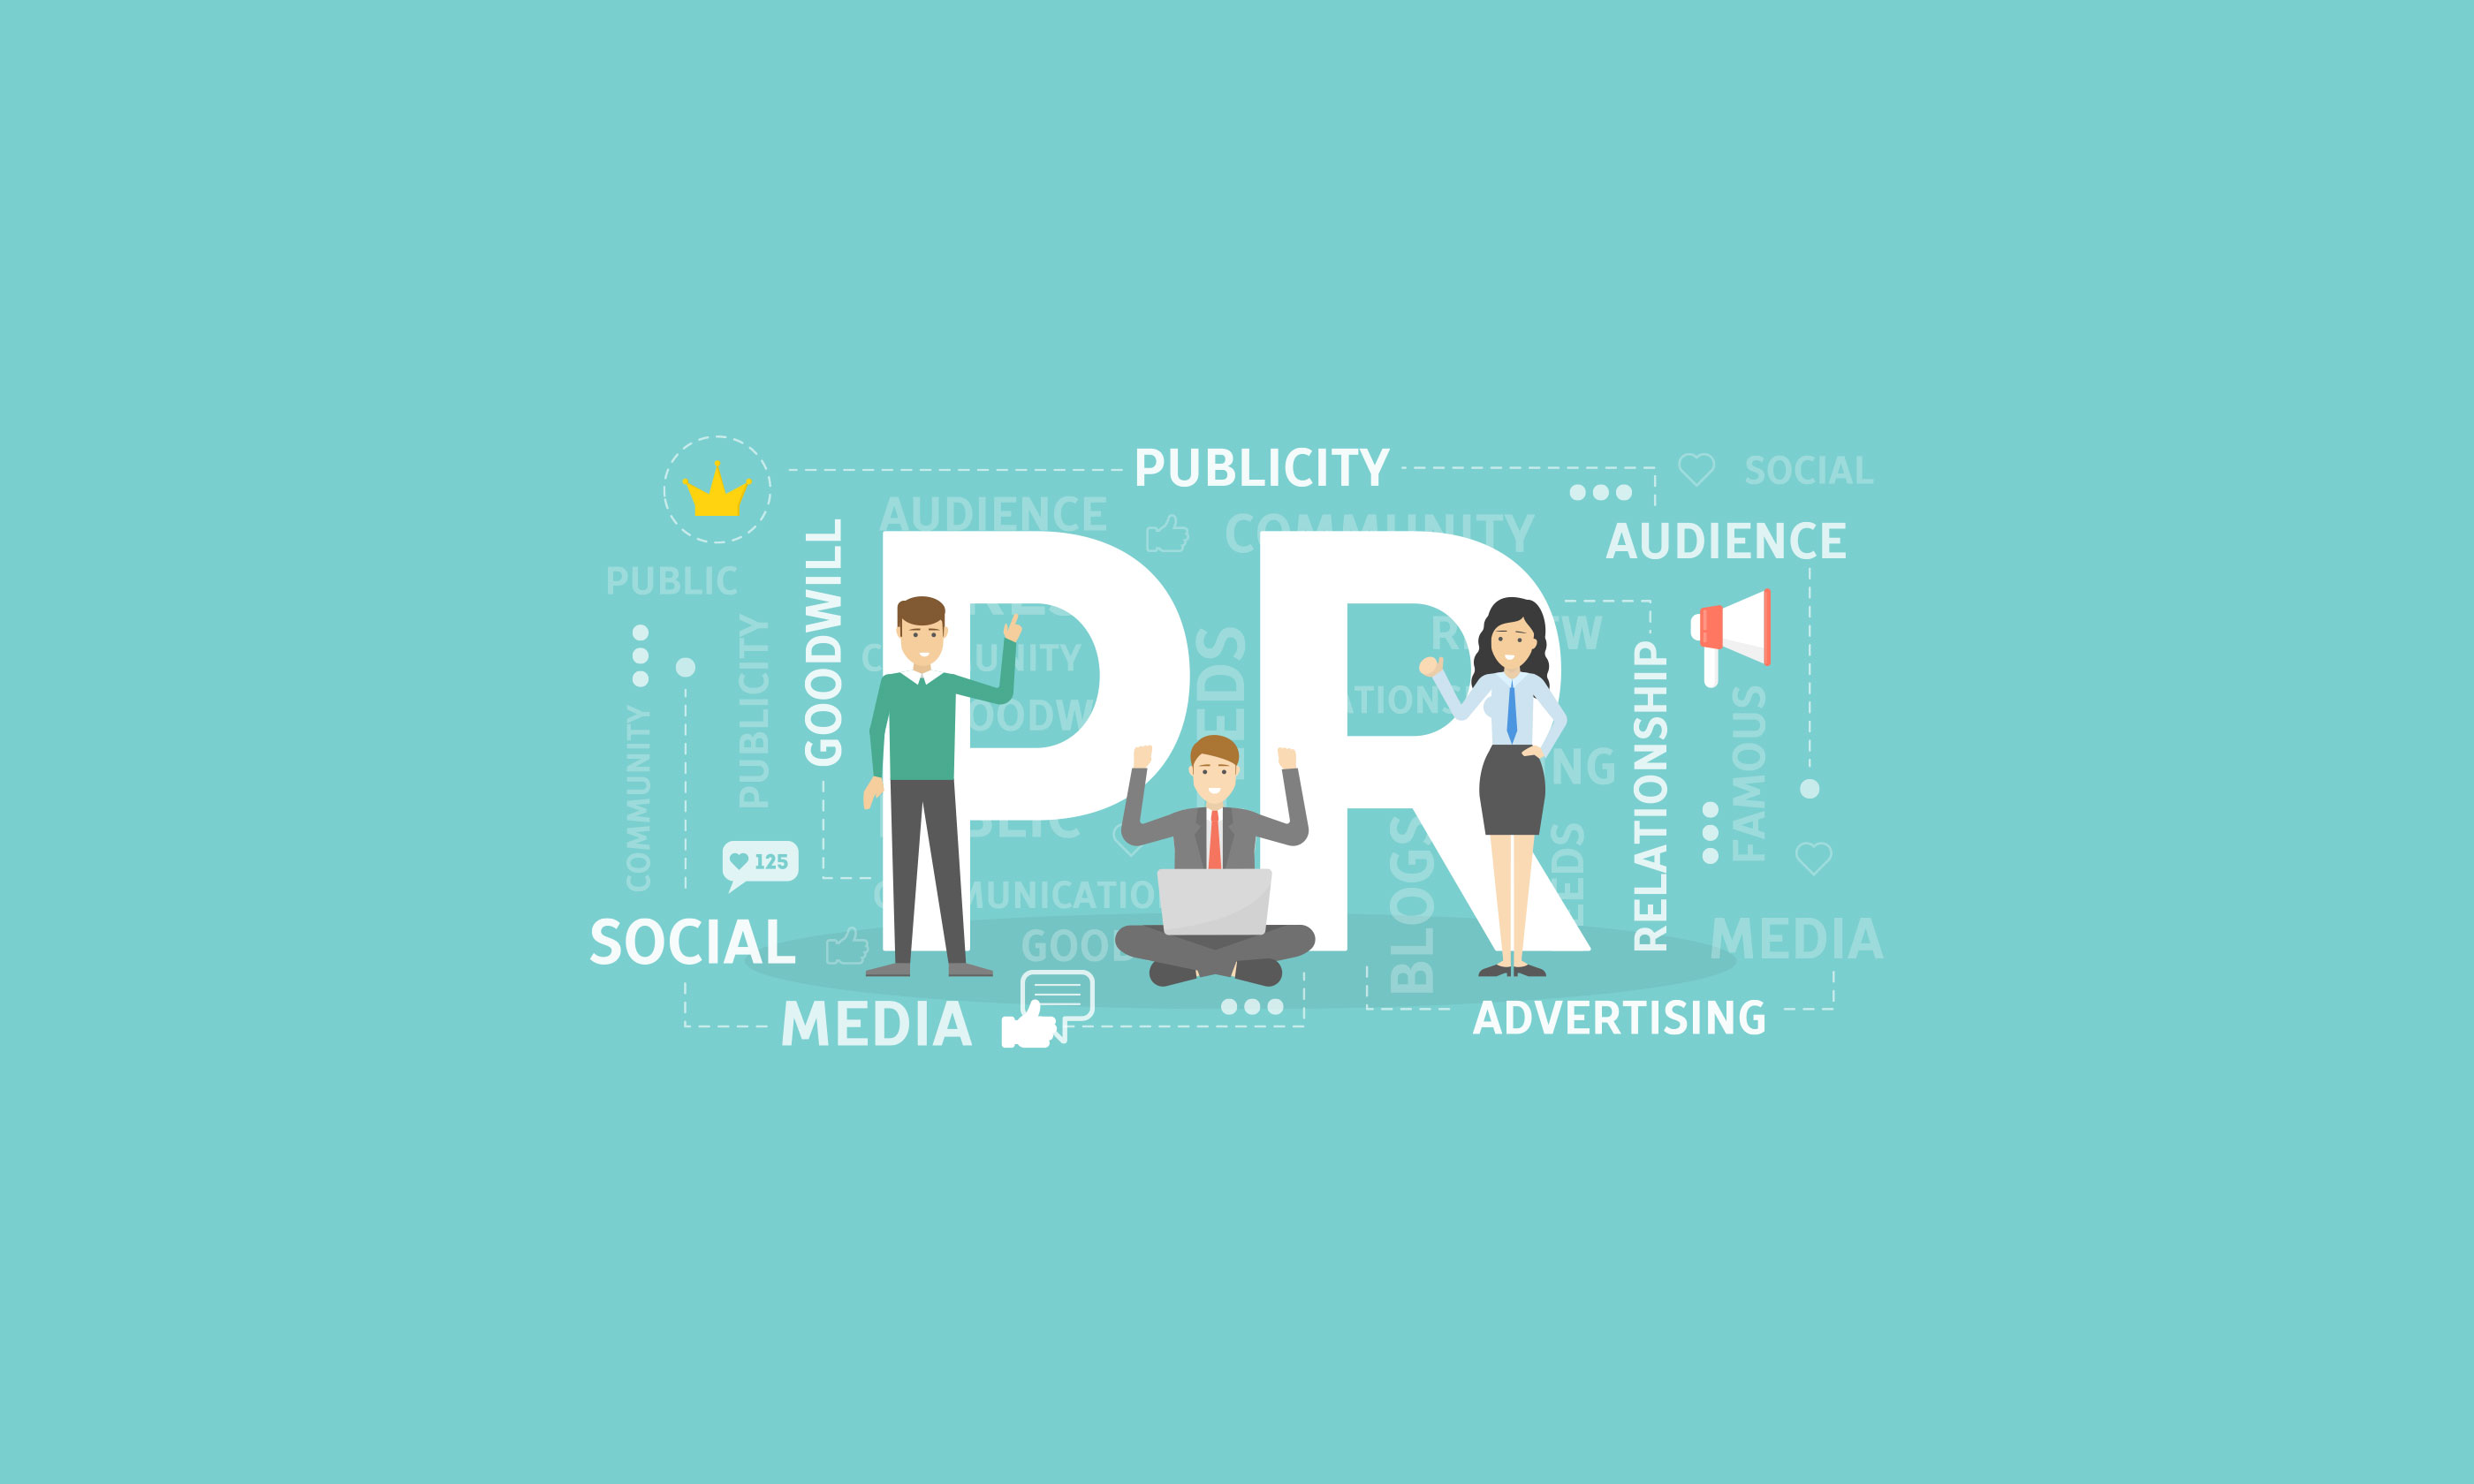 PR - Public Relations Management and Public Relations Marketing Slider